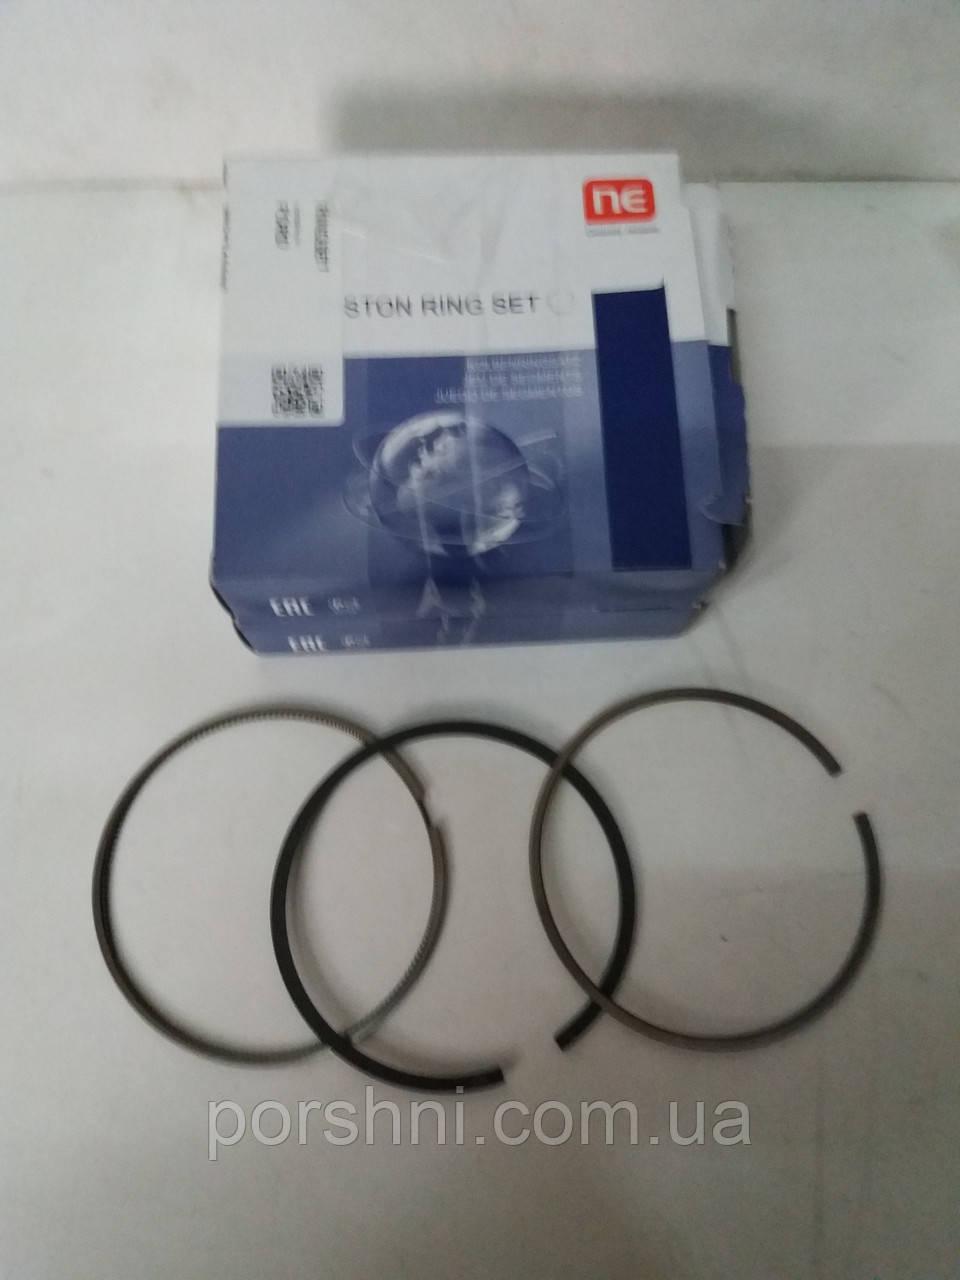 Кольца  Форд Фокус 79,0 STD    ( 1,2 x 1.2 x 2 )  1,6  ECO  BOOST